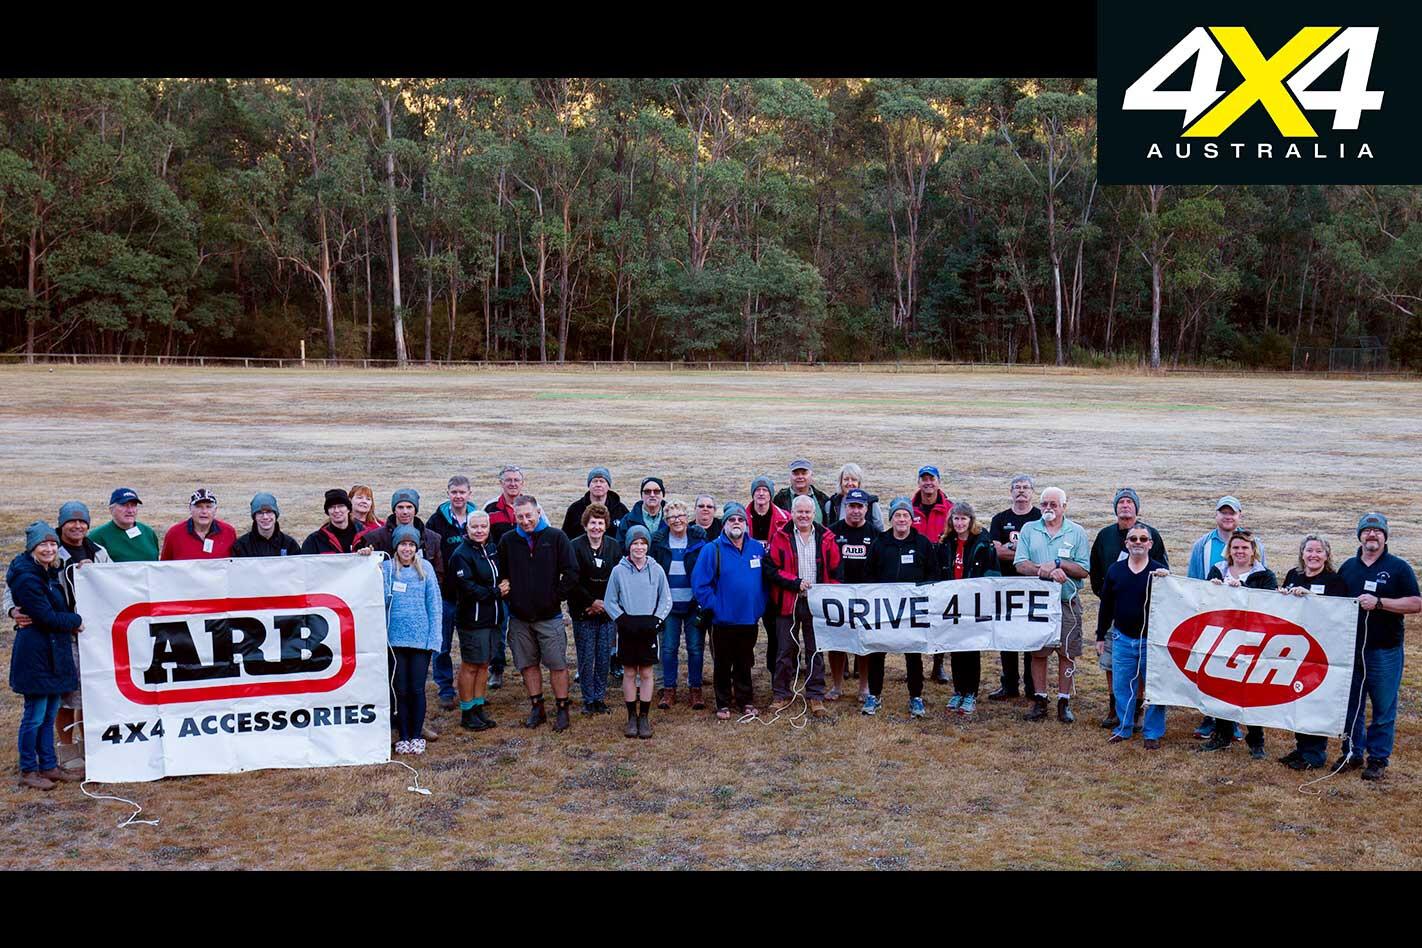 Drive 4 Life Participants Photo Op Jpg